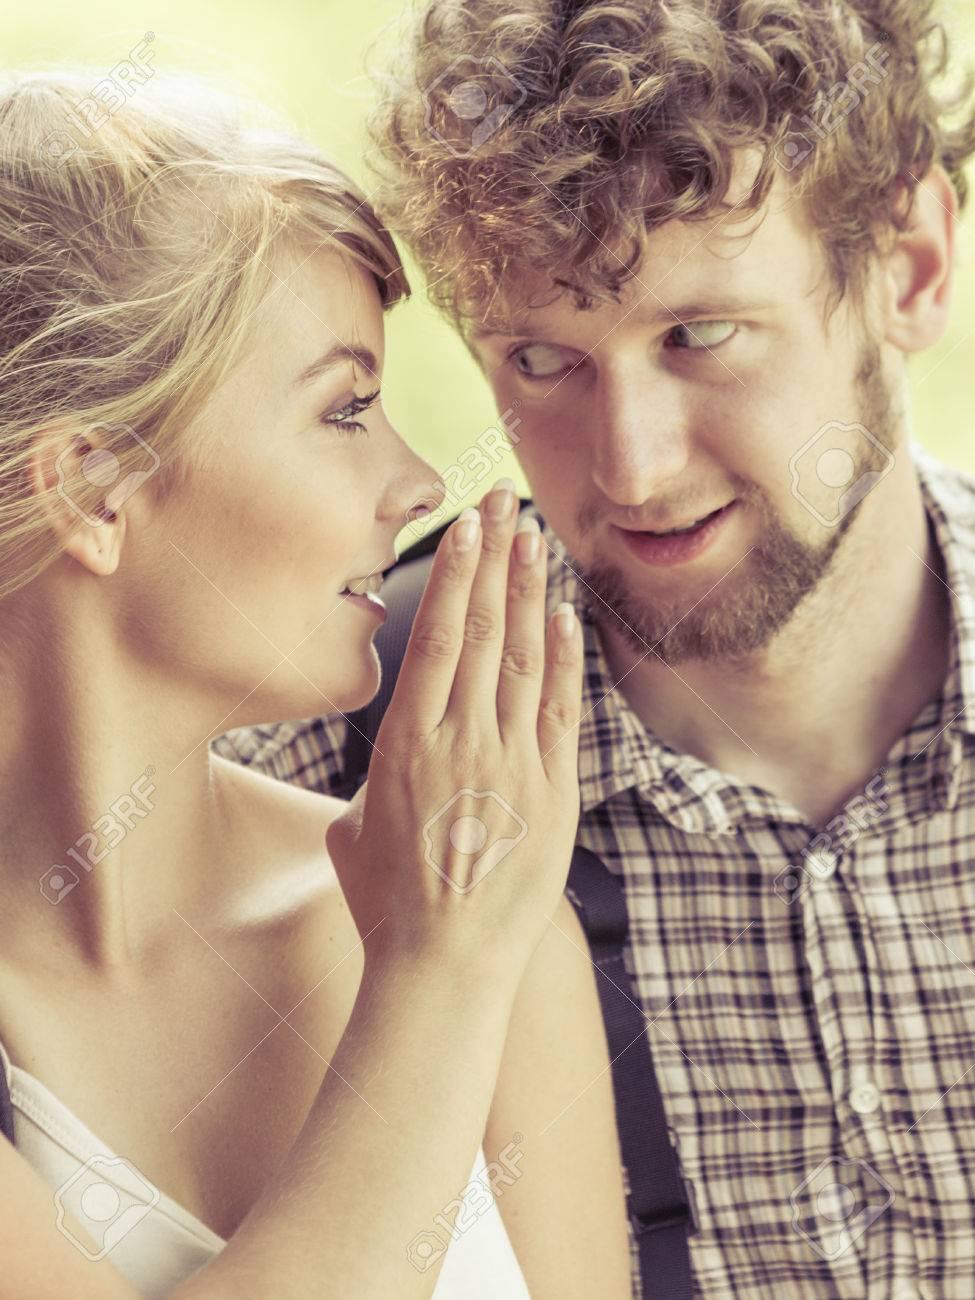 hiker dating online dating for single parent